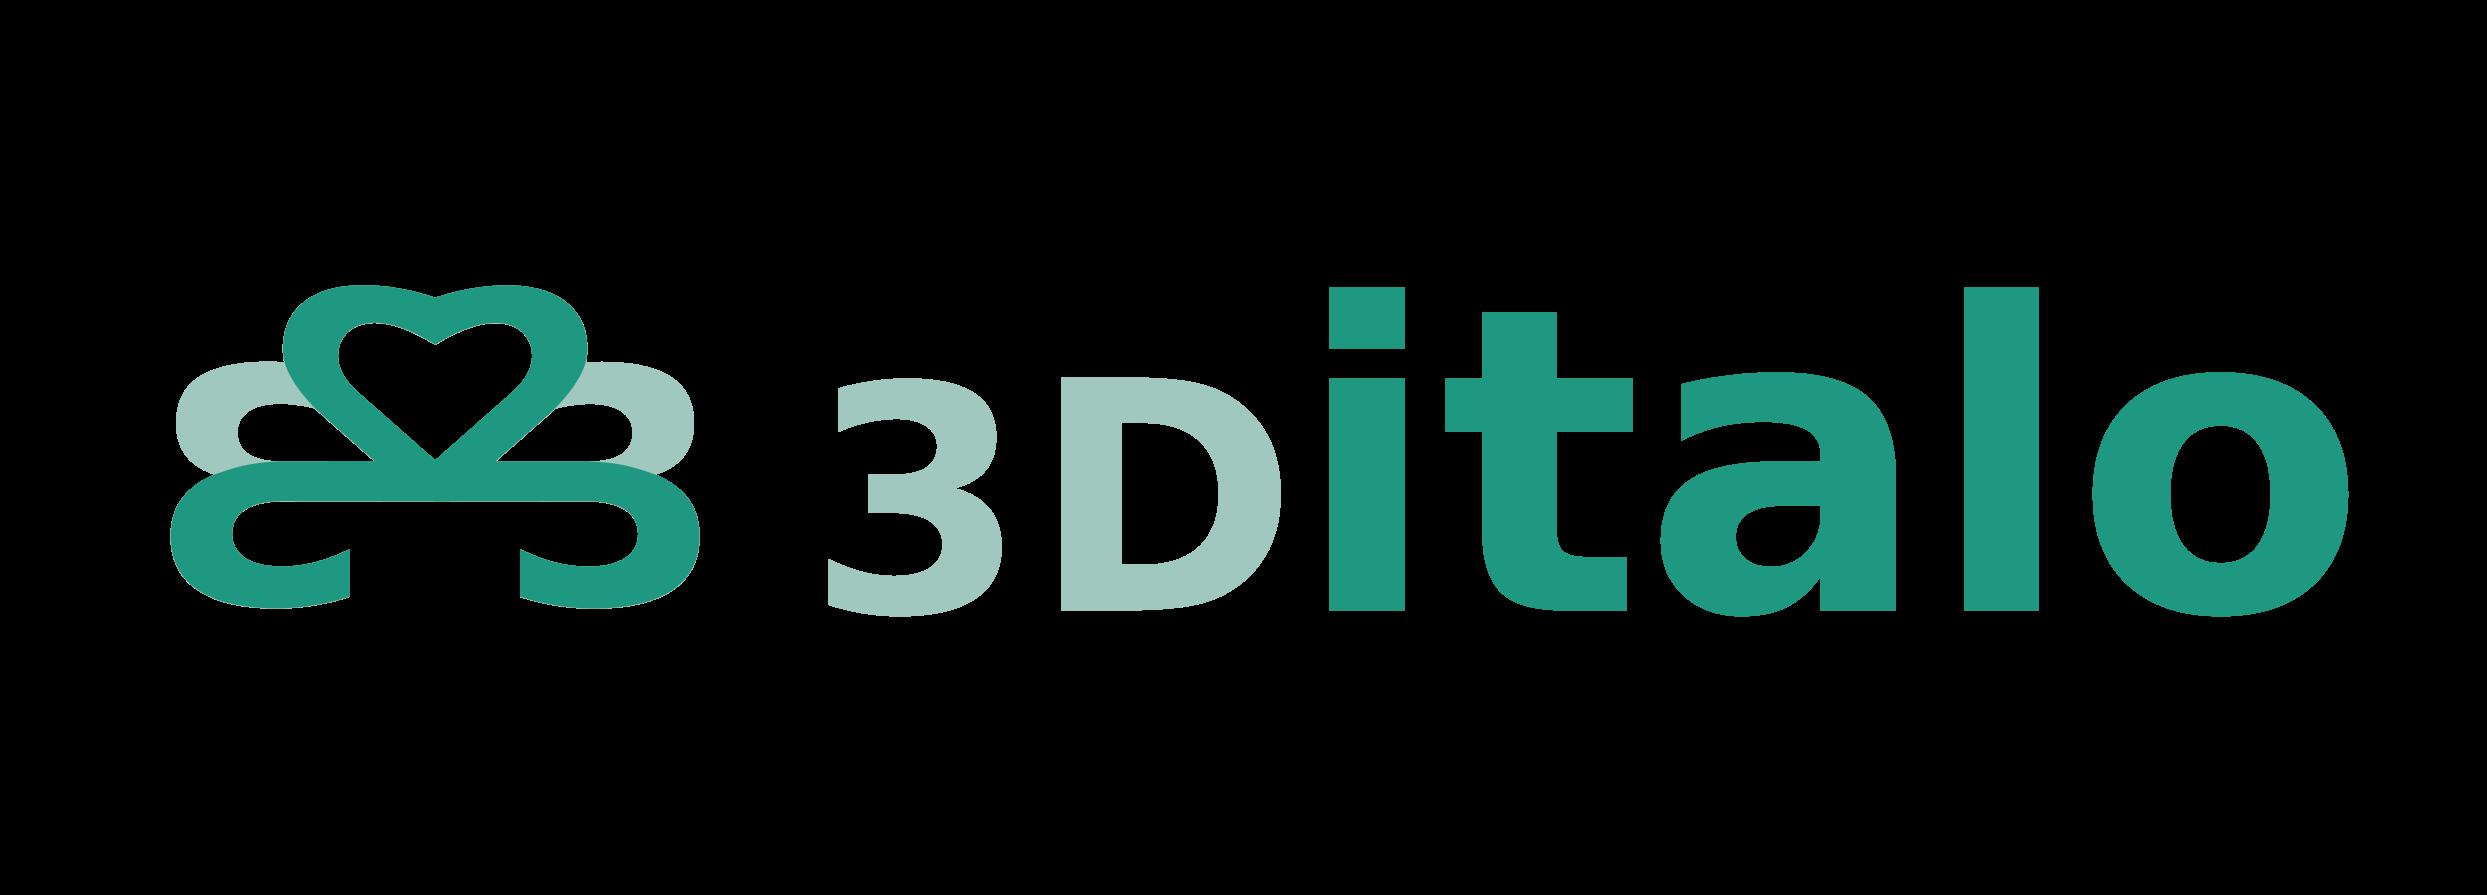 Distribuidor 3ditalo